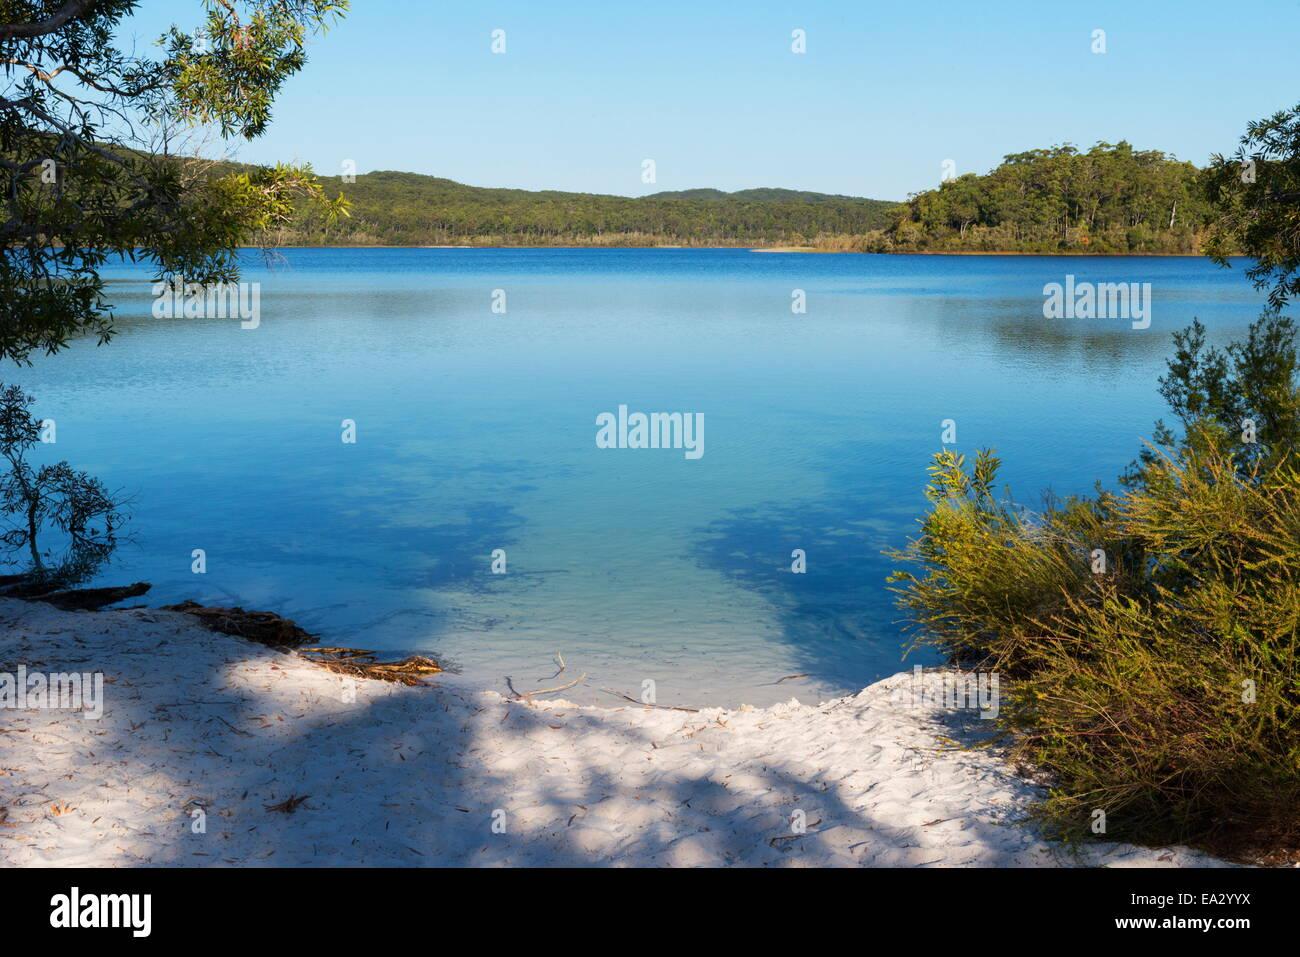 Le Lac McKenzie, Fraser Island, UNESCO World Heritage Site, Queensland, Australie, Pacifique Photo Stock